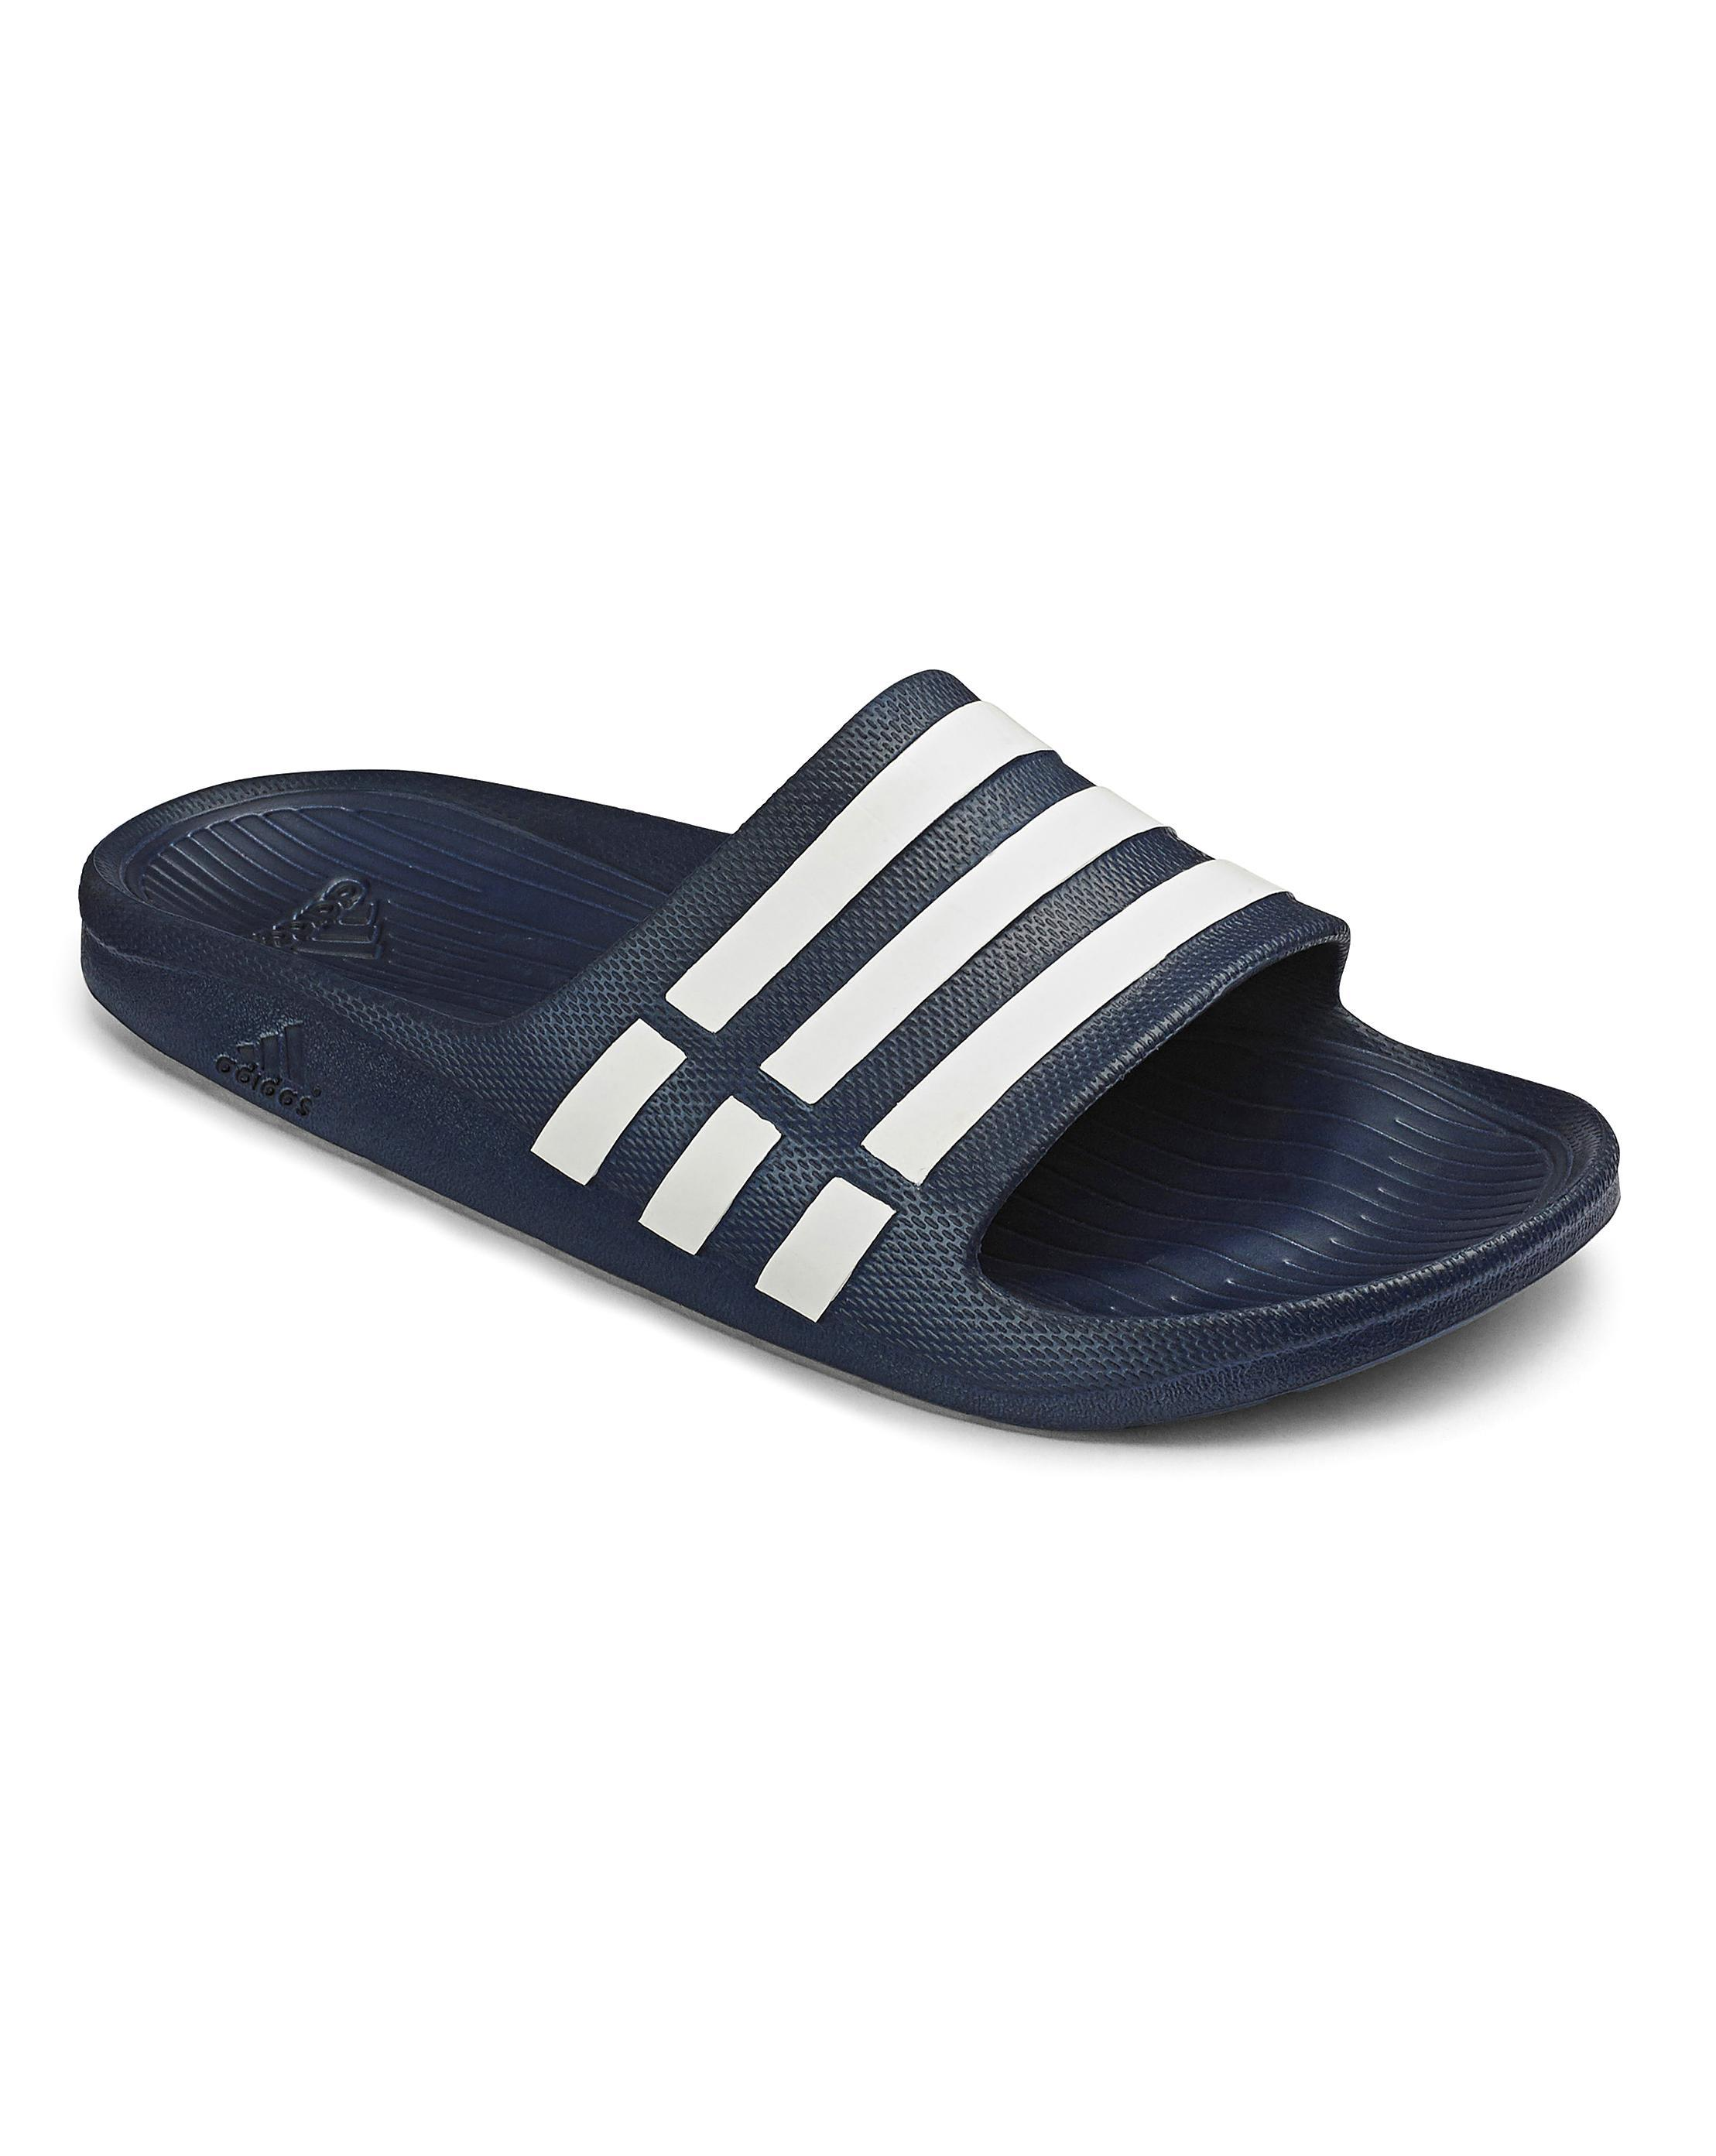 2495c8c4d2cc Lyst - Simply Be Adidas Duramo Slider in Blue for Men